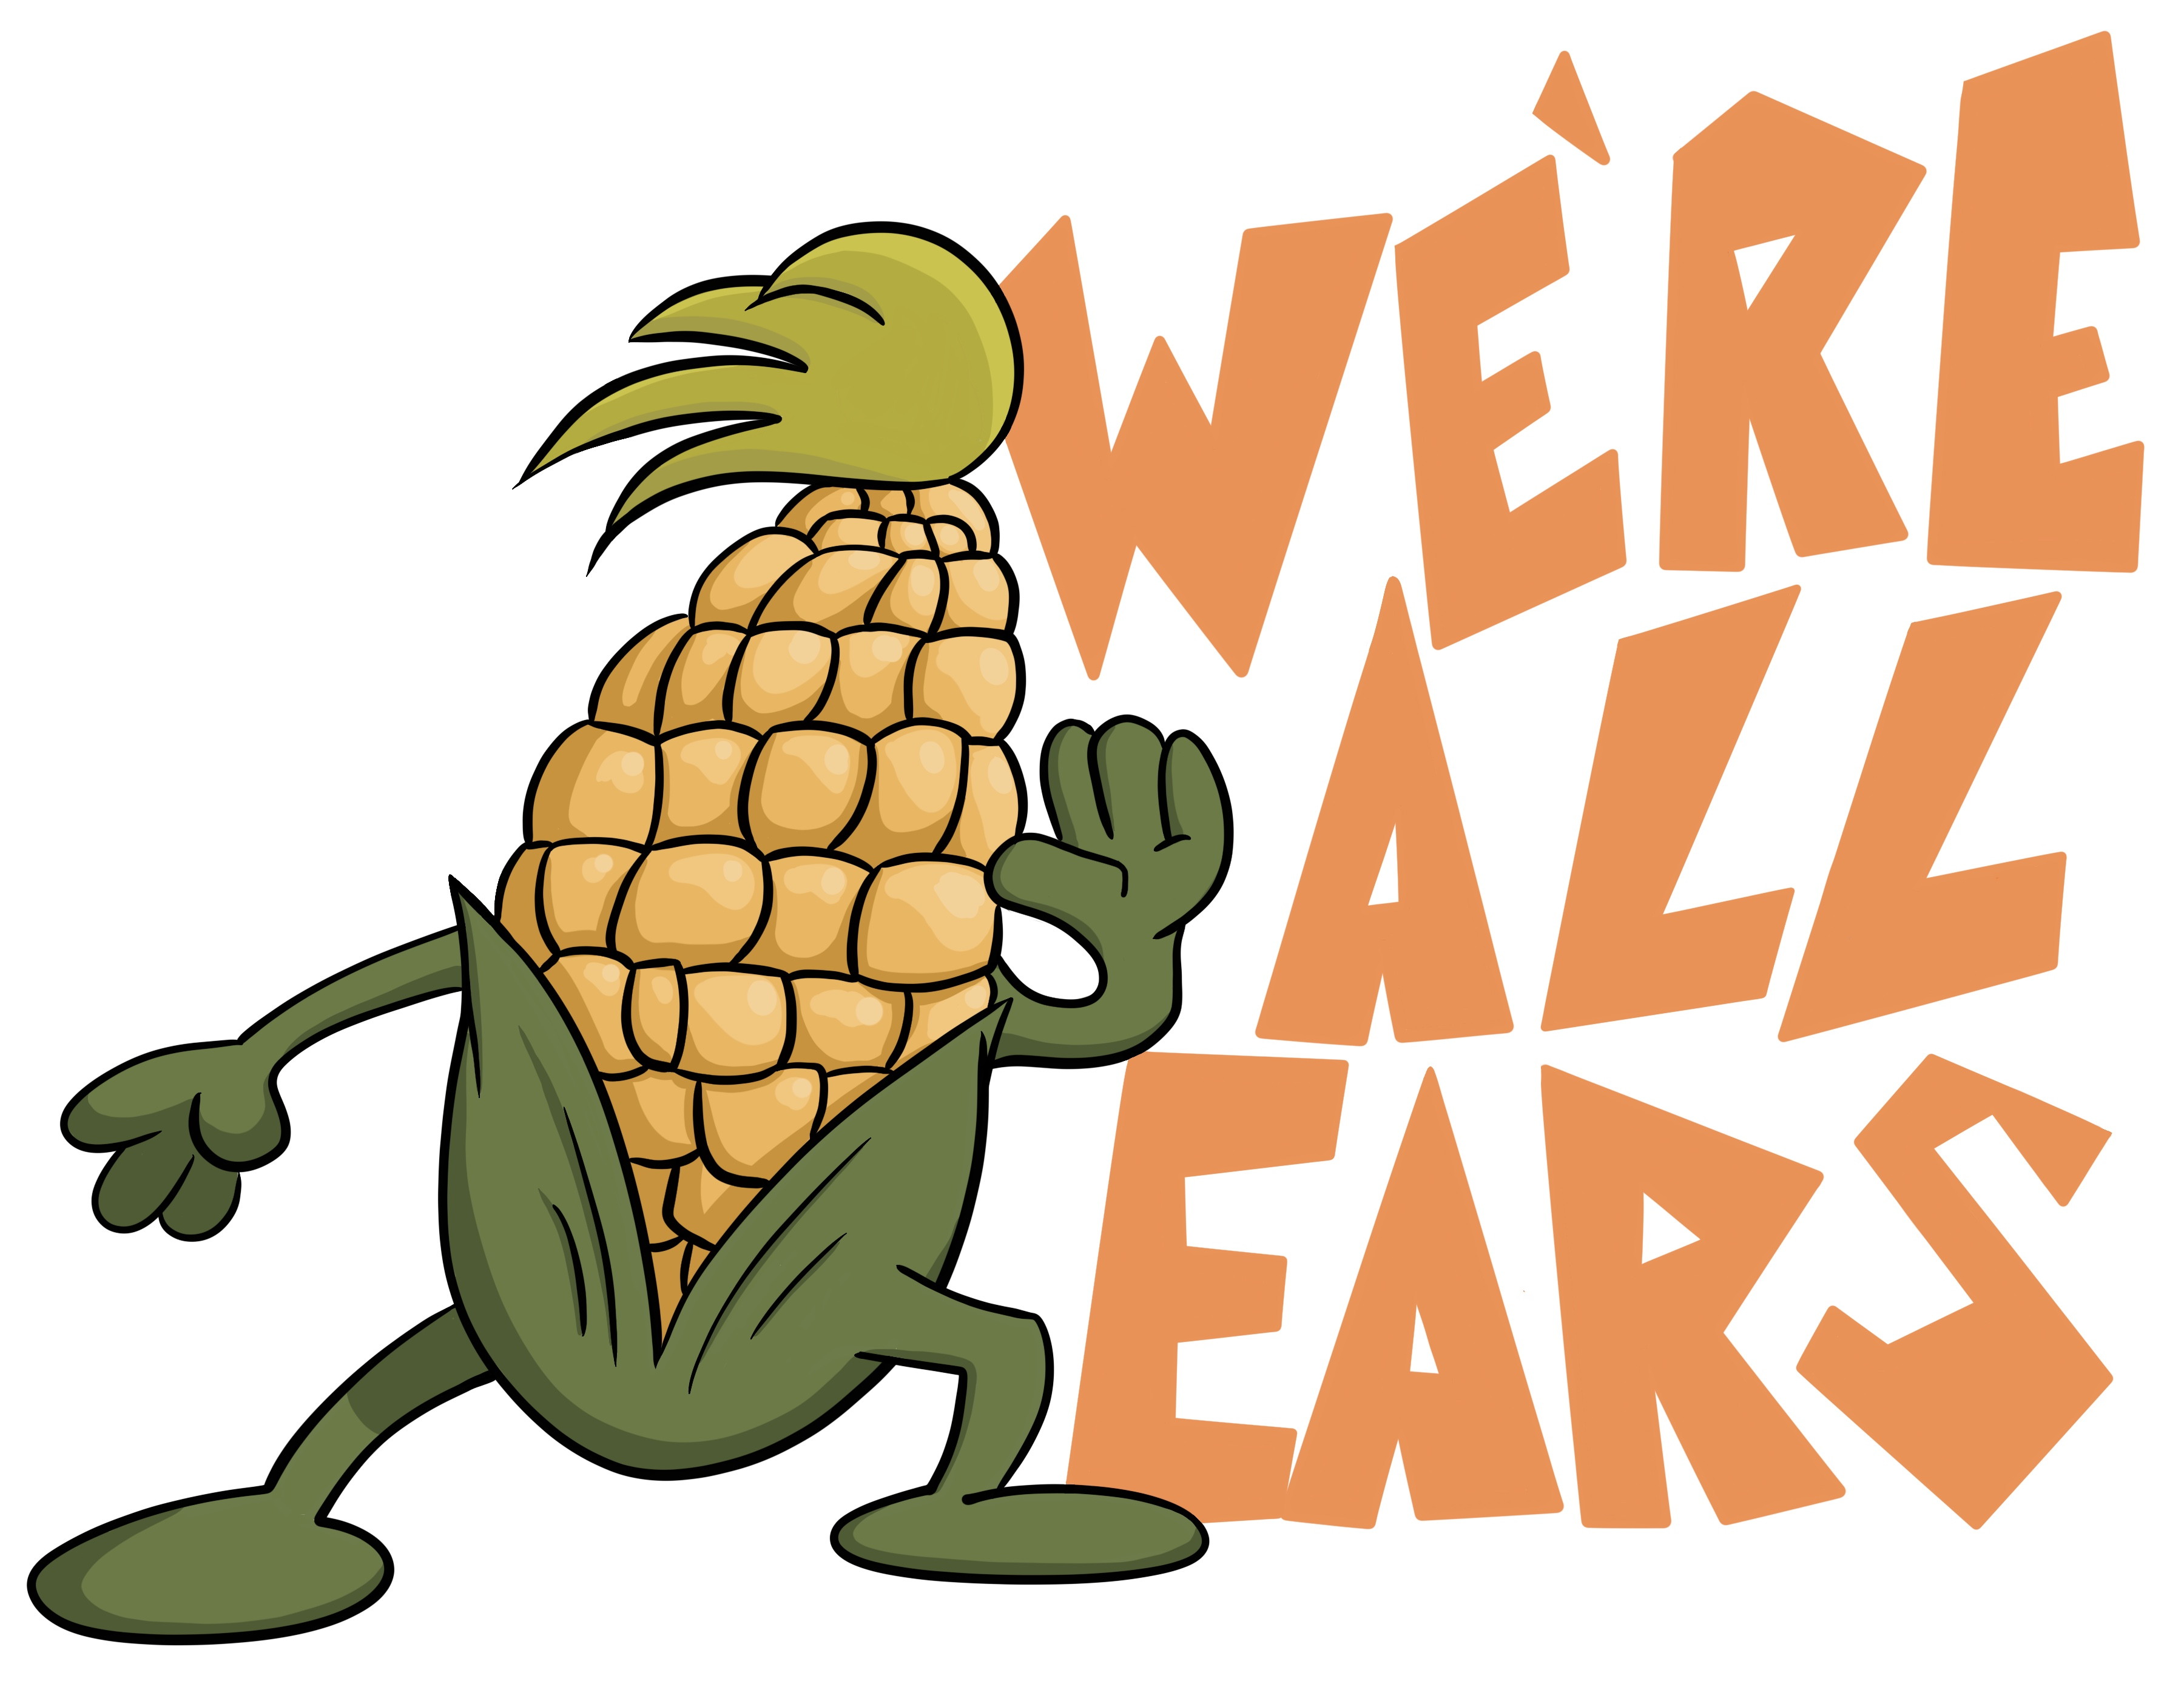 we-re-all-ears-tshirt-pun-orginal-artowrk-2.jpeg